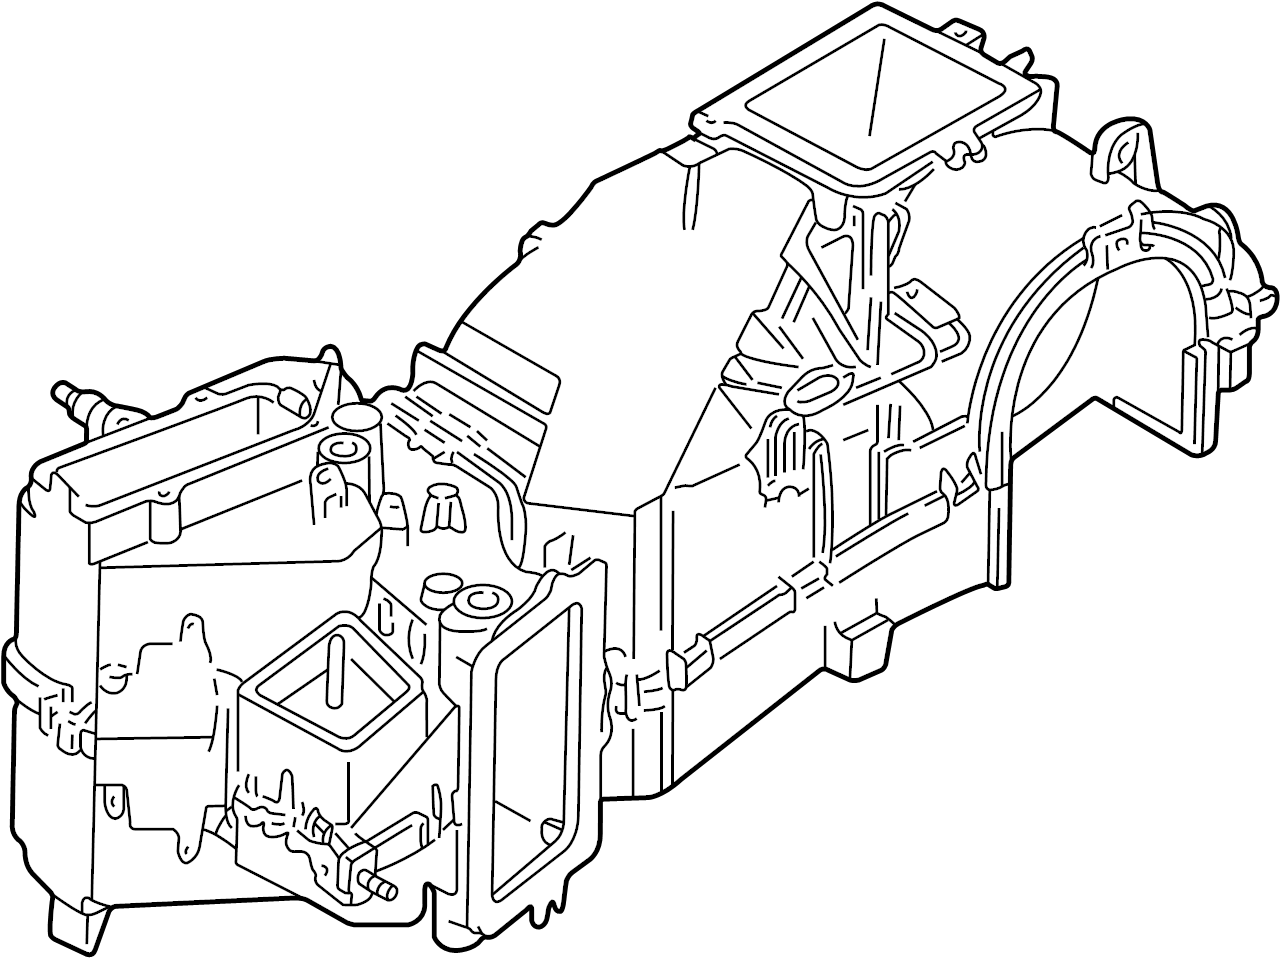 1999 volkswagen cabrio evaporator evaporator core includes housing assy 1h1820103c. Black Bedroom Furniture Sets. Home Design Ideas